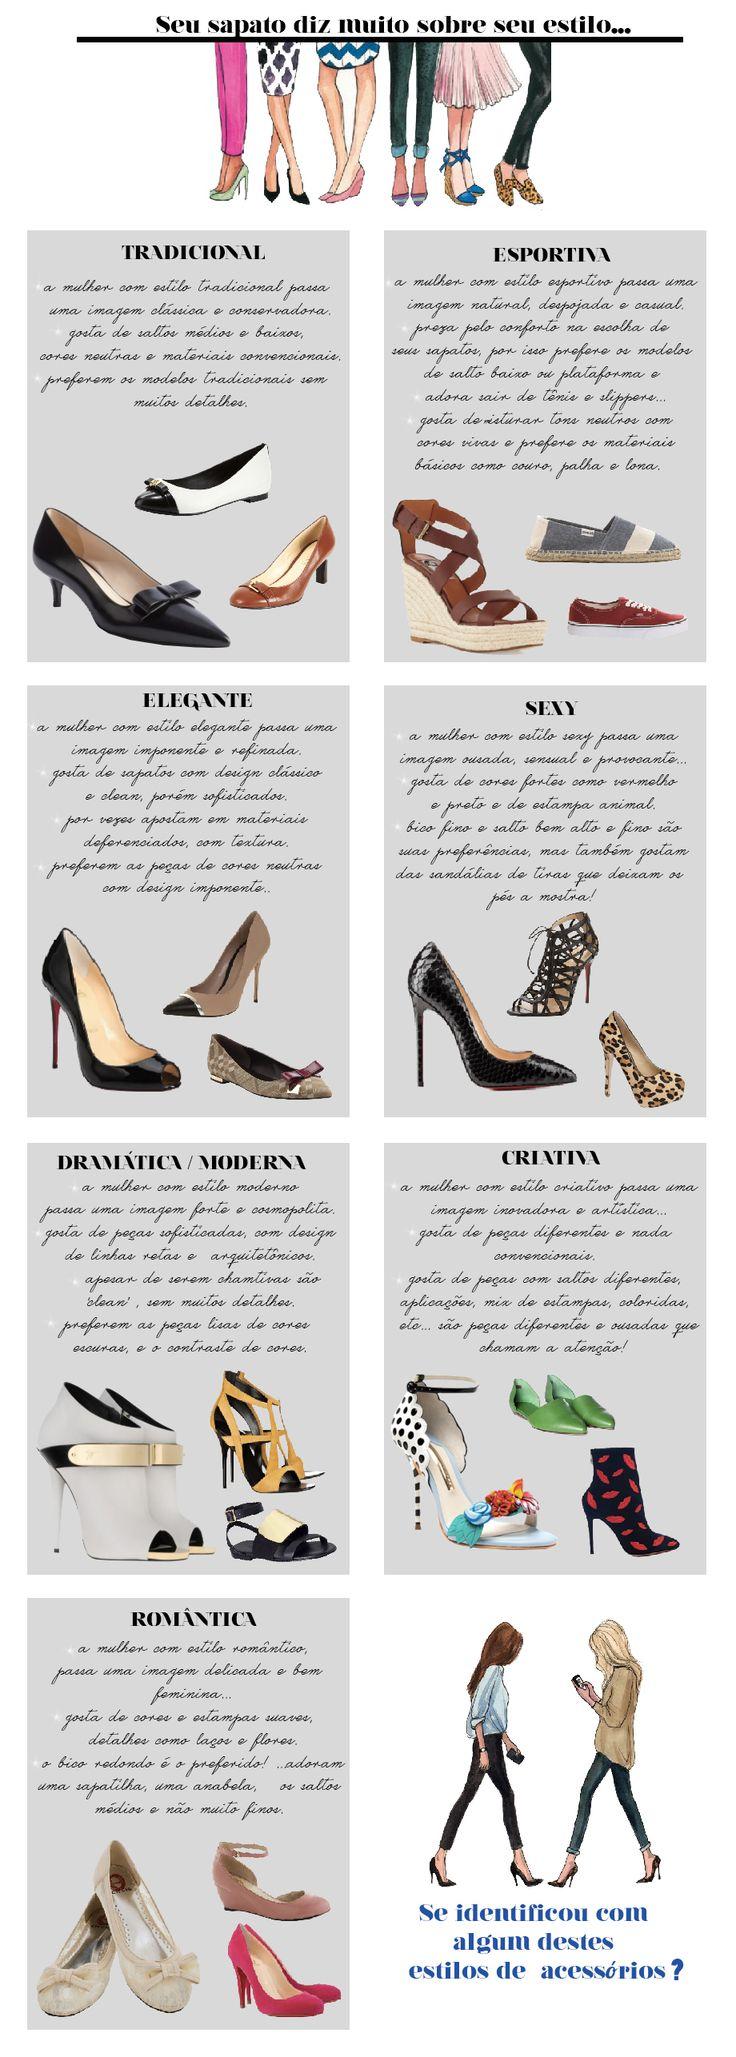 Estilo Pessoal, moda, sapatos, consultoria de estilo, fashion, style, image consulting